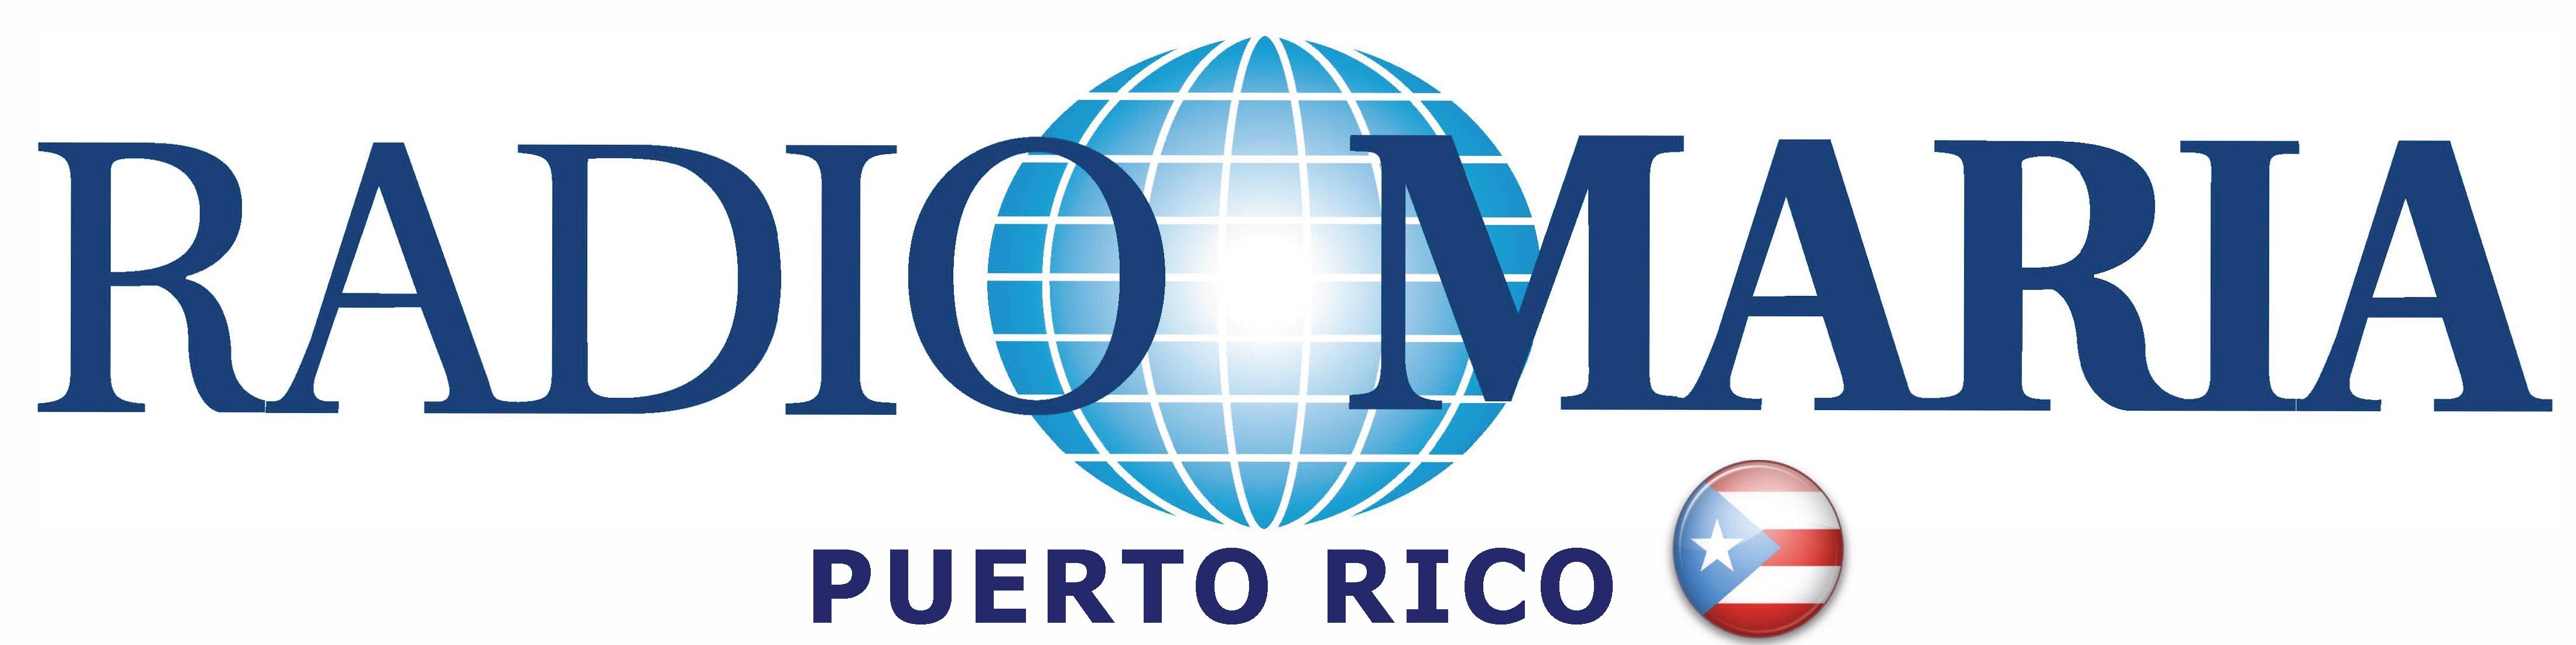 Rm Puerto Rico 01